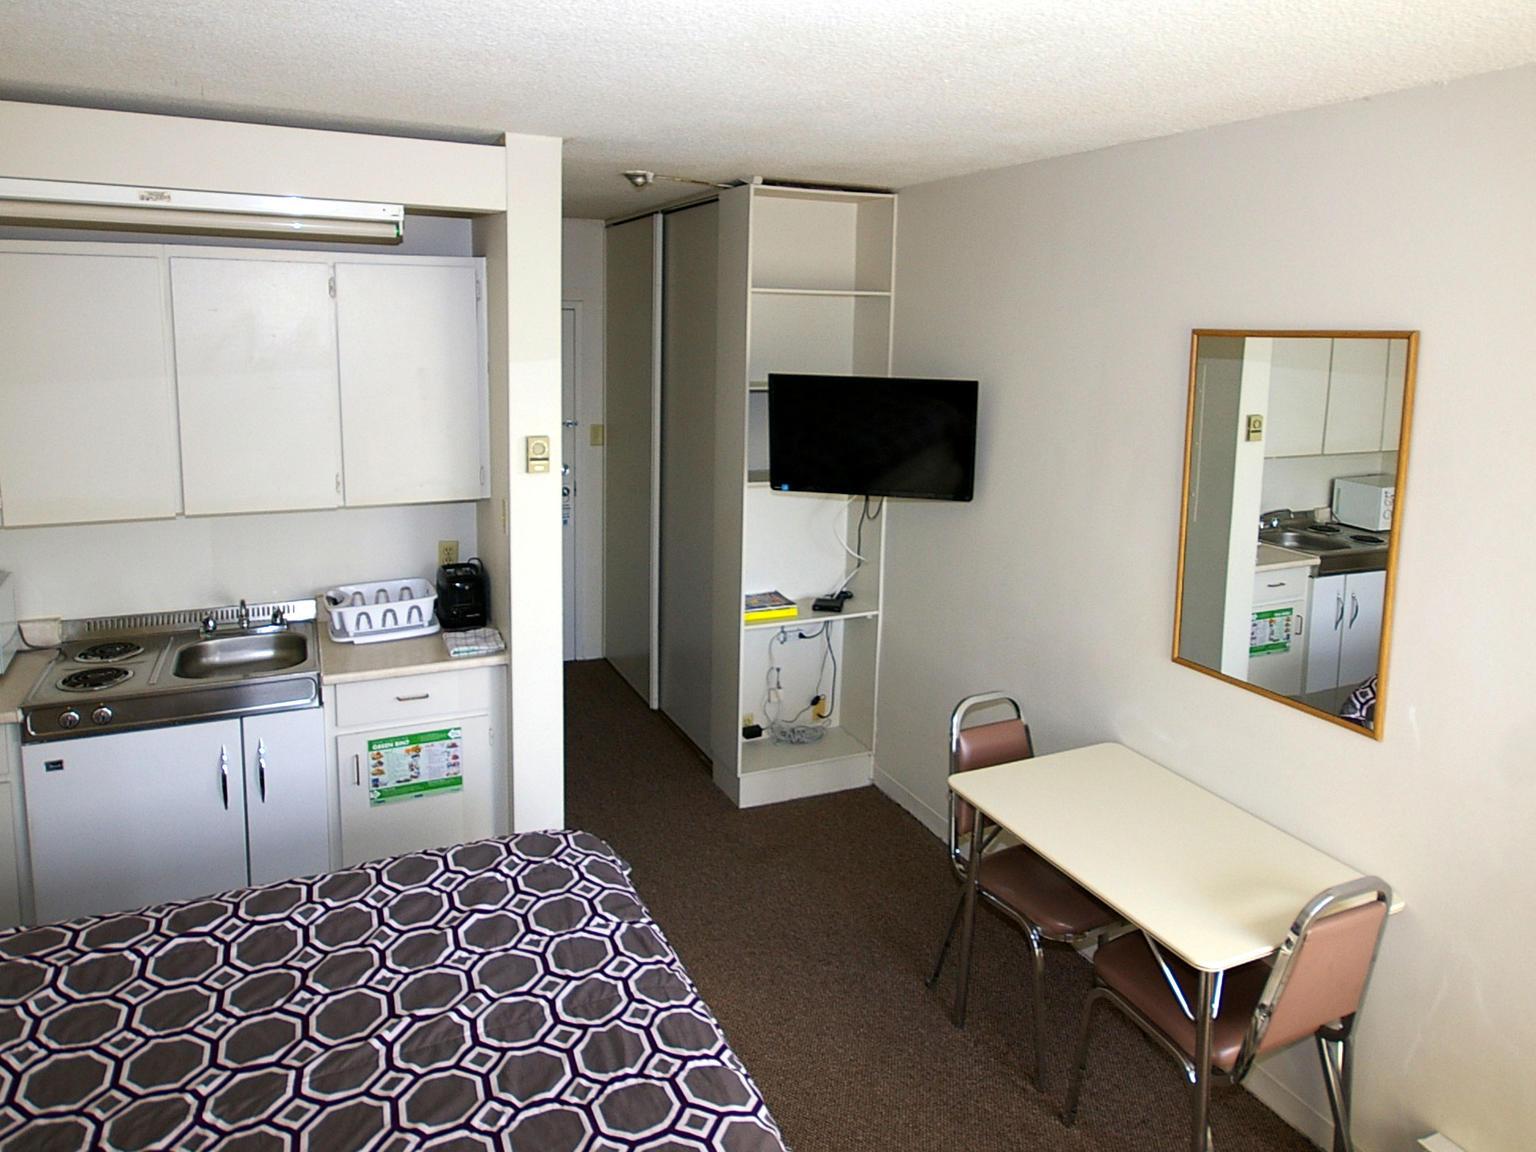 toronto_acc_alexandra-hotel_bedroom_03